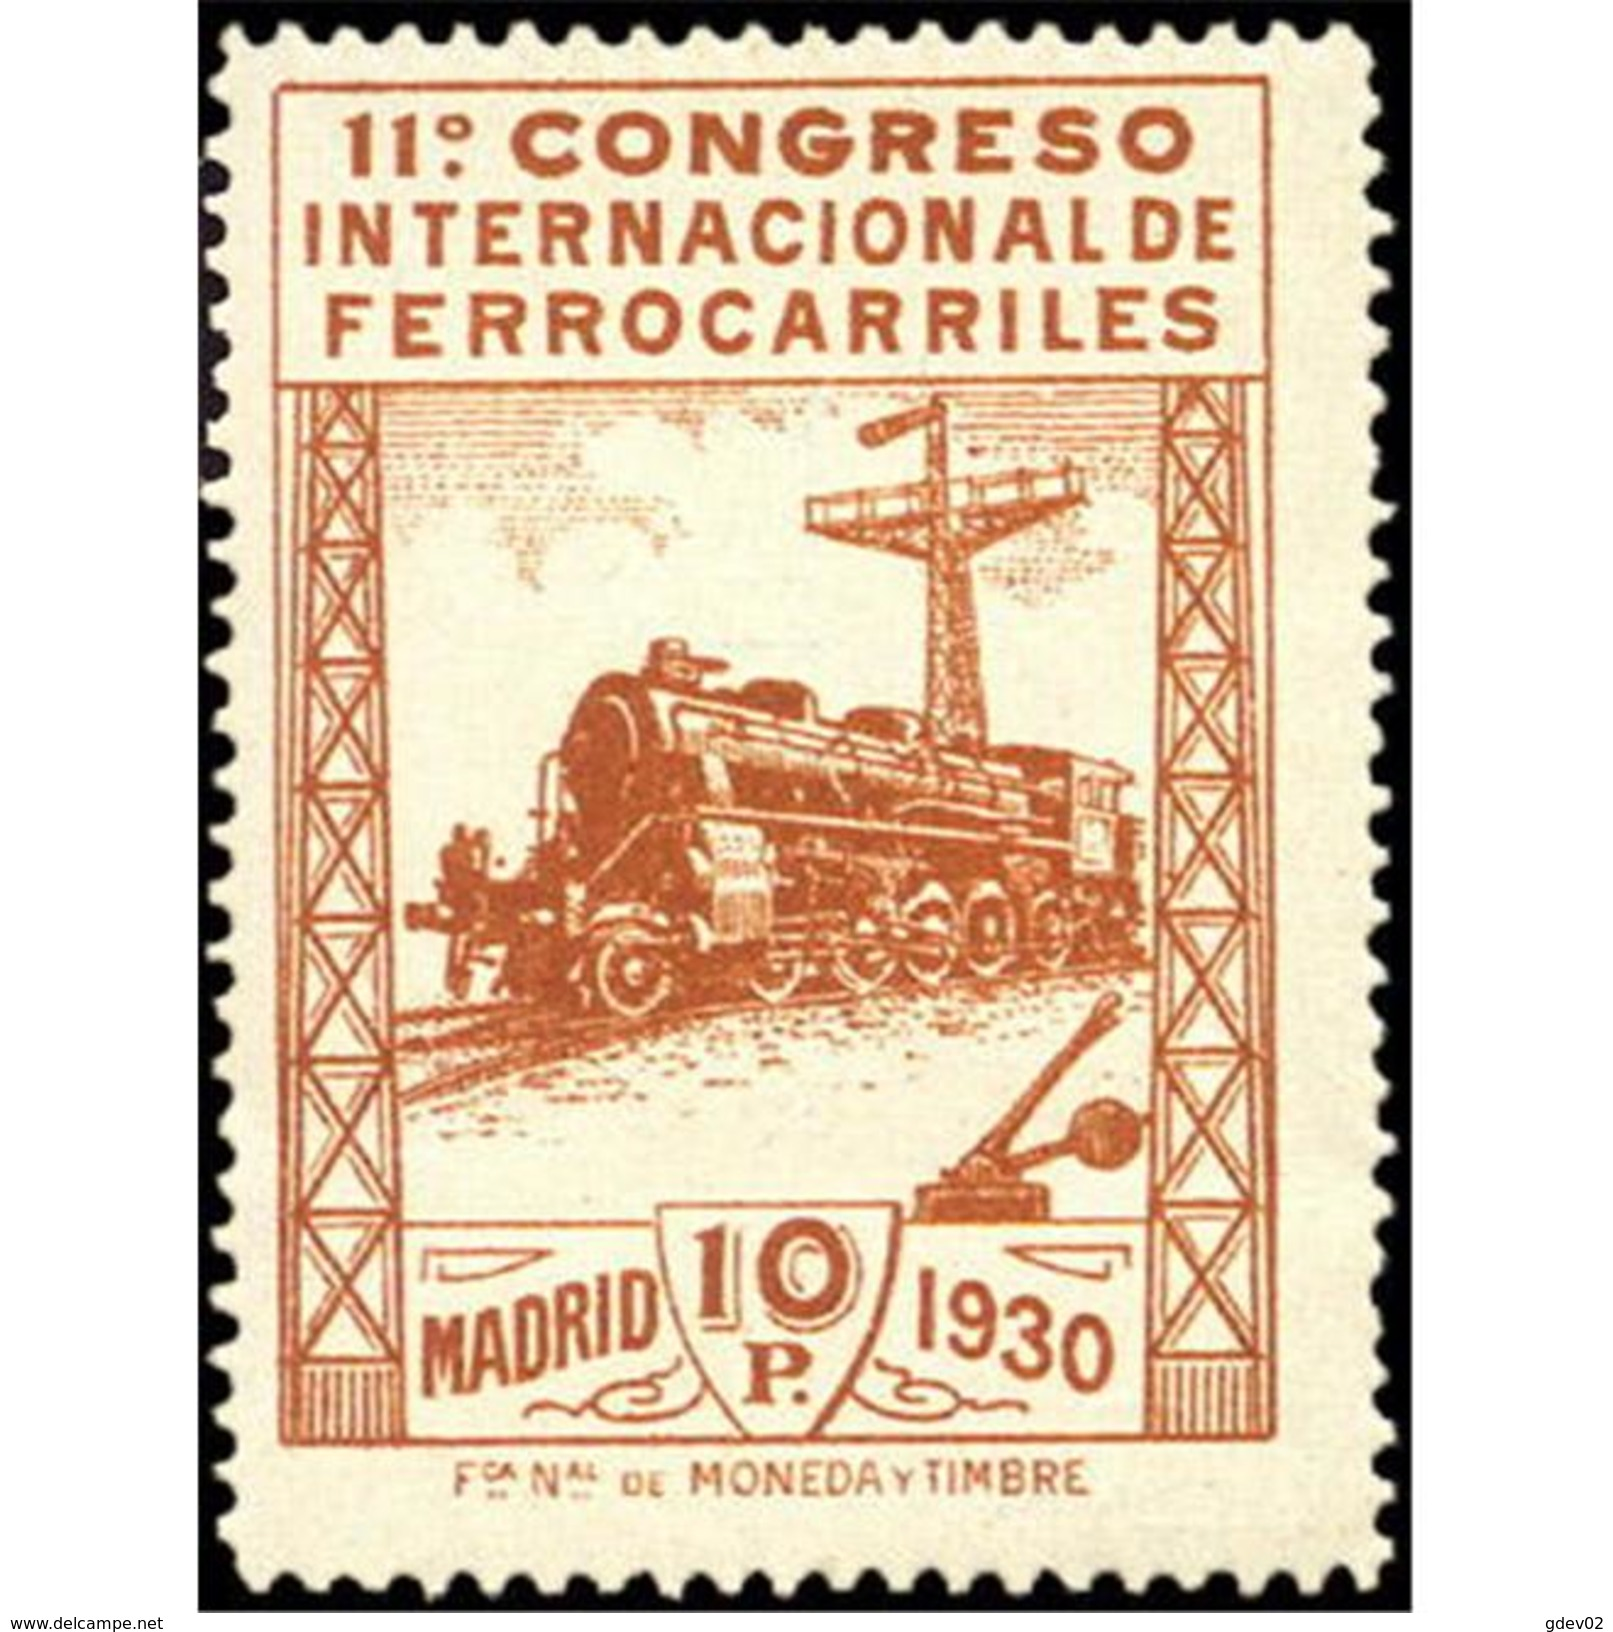 ES481STV-LFT***481STAN.Spain.Esgane.AVION,Congreso Internacional De FERROCARRILES.1930 (Ed 481**) - 1889-1931 Reino: Alfonso XIII